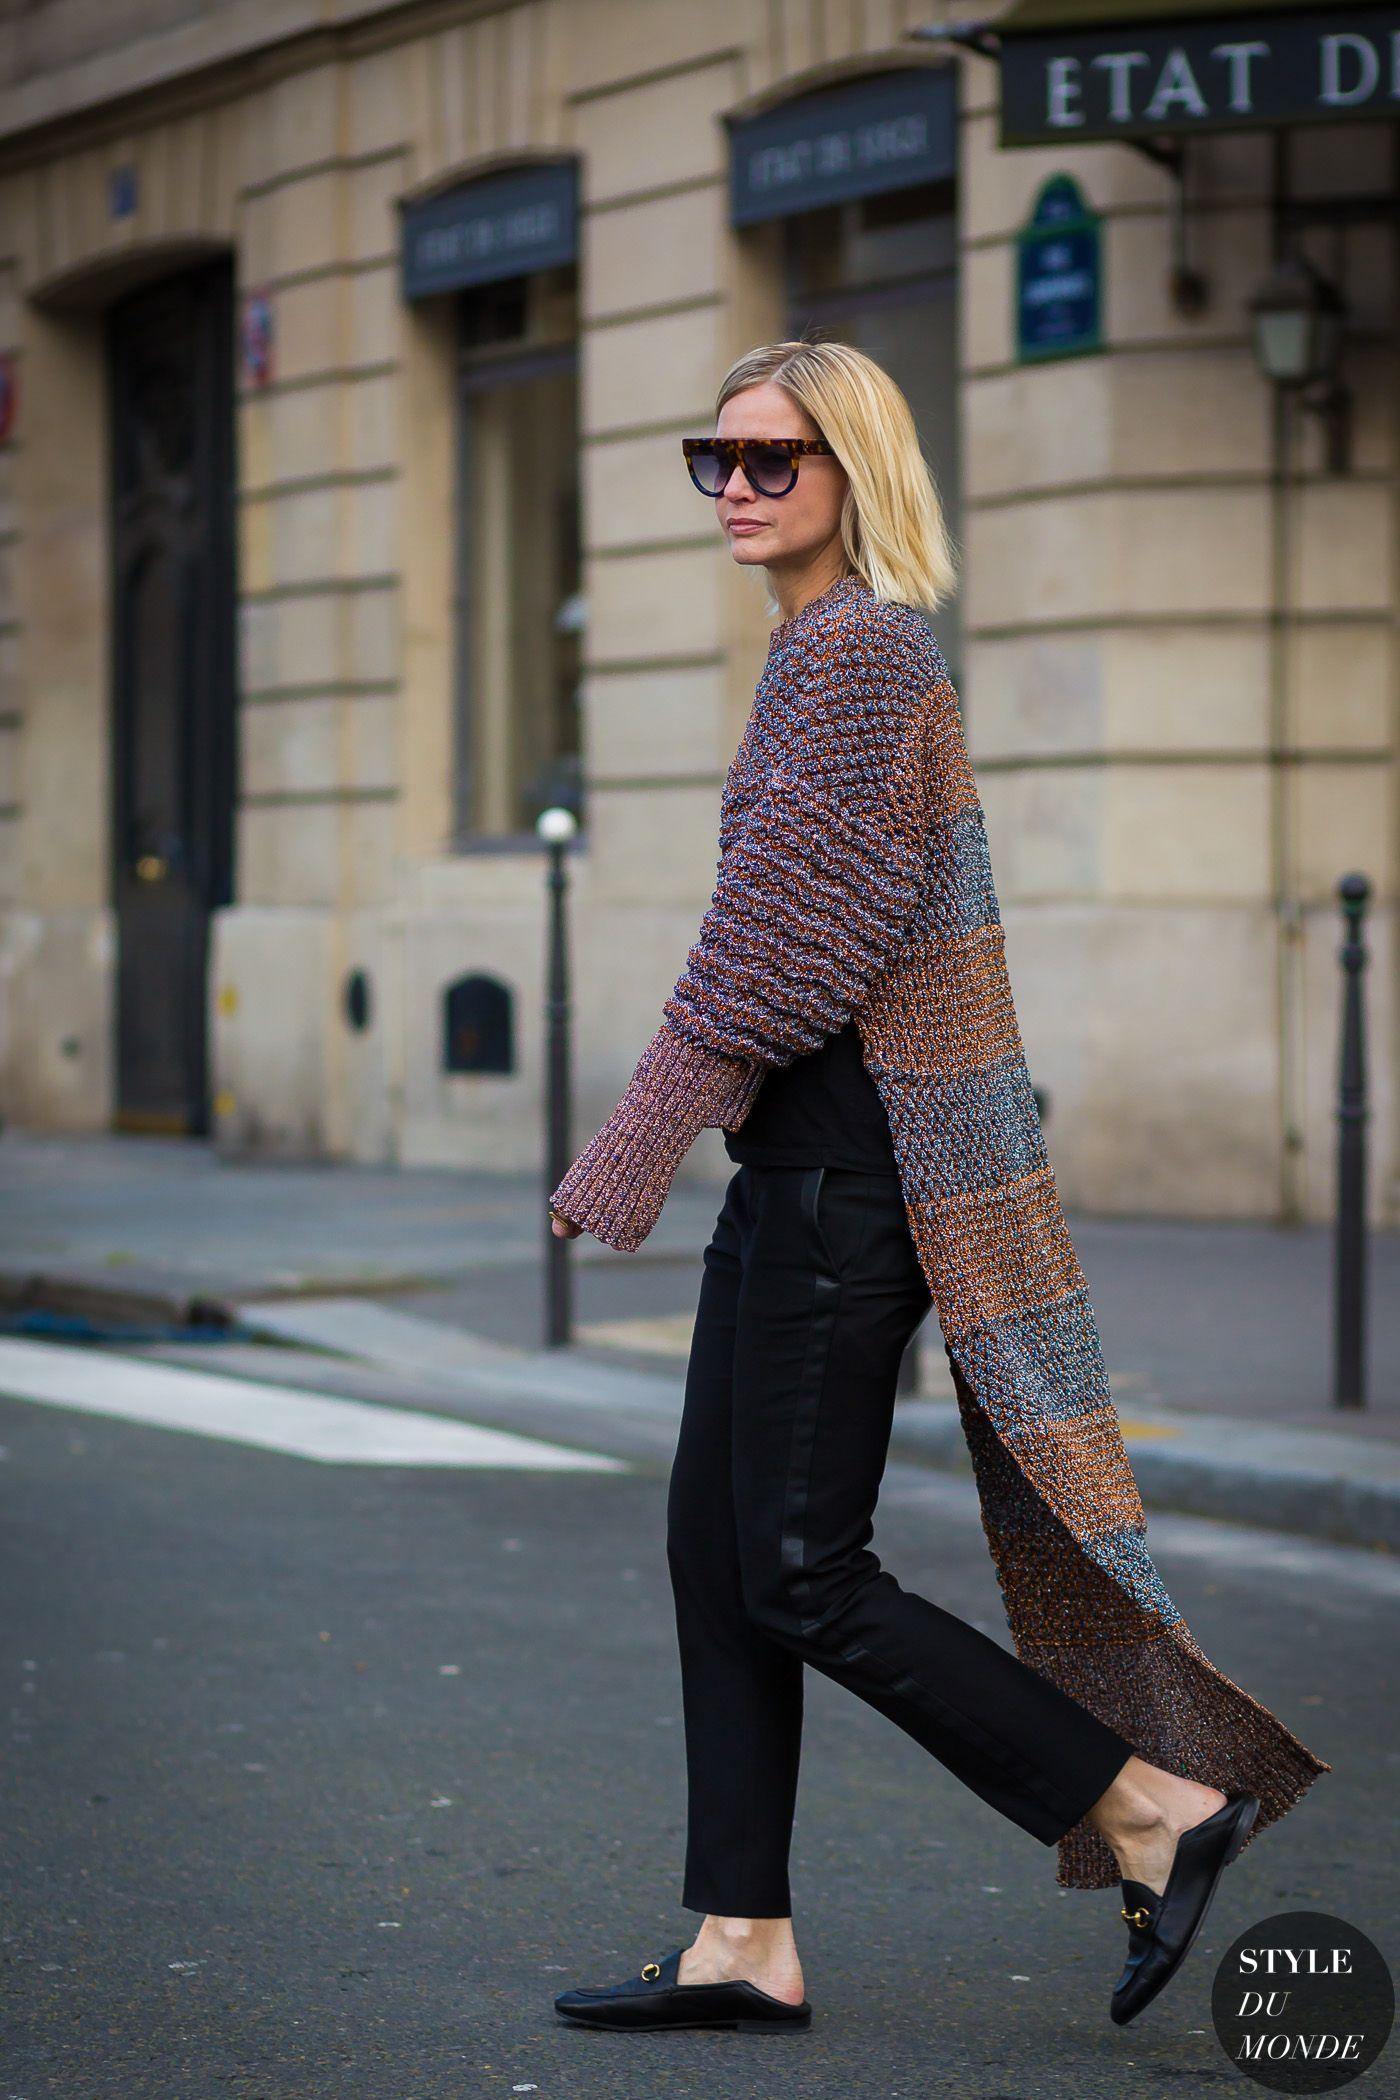 Paris Fashion Week FW 2016 Street Style: Holli Rogers